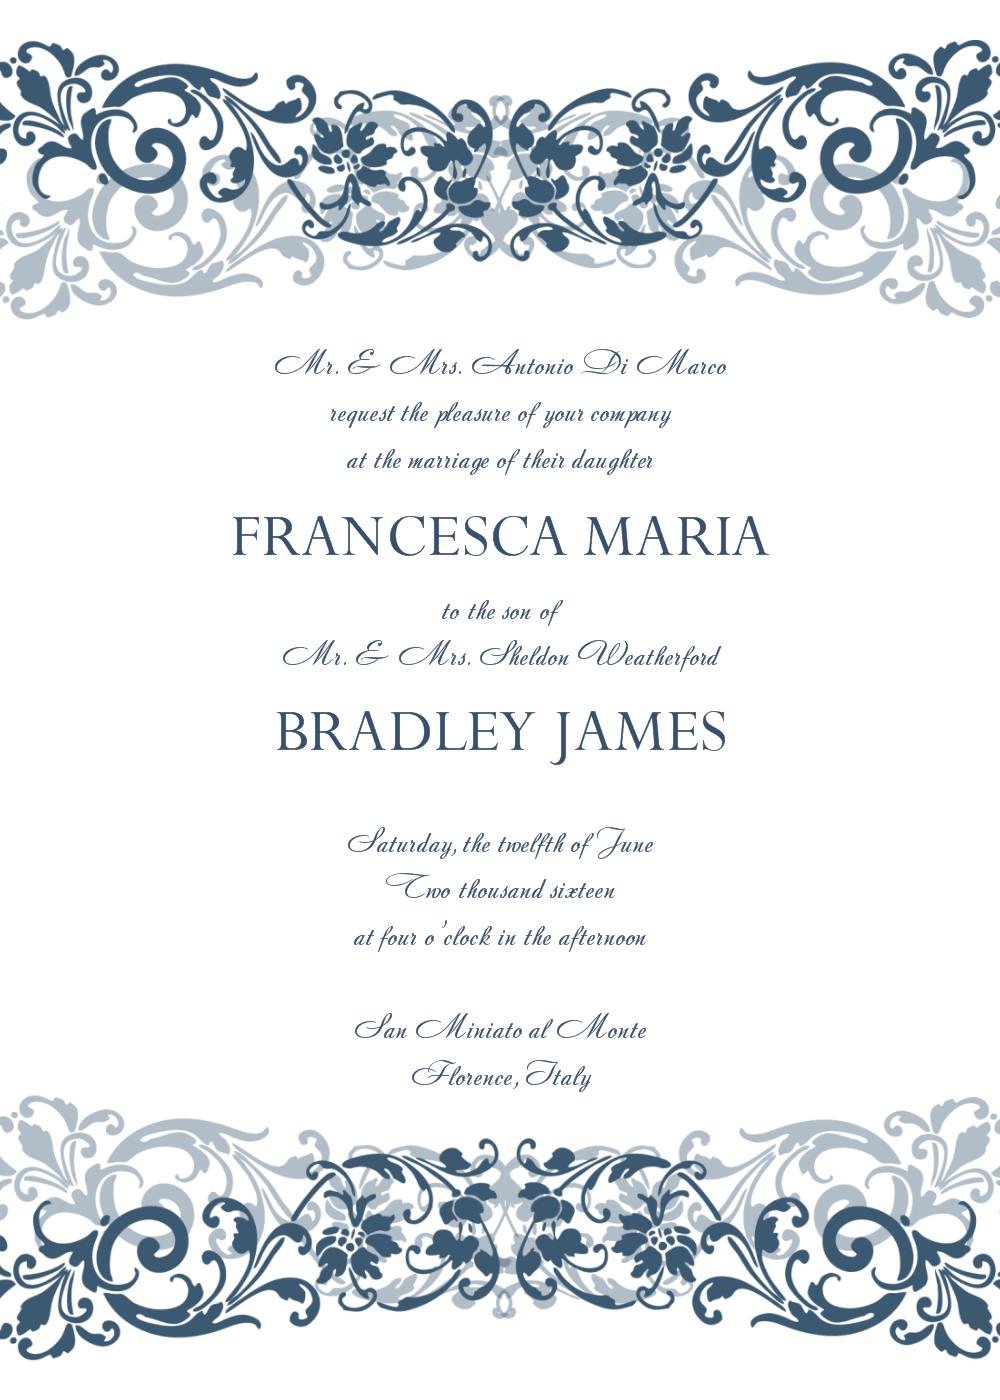 Free Wedding Invitation Templates For Word   Wedding Invitation - Free Printable Wedding Scrolls